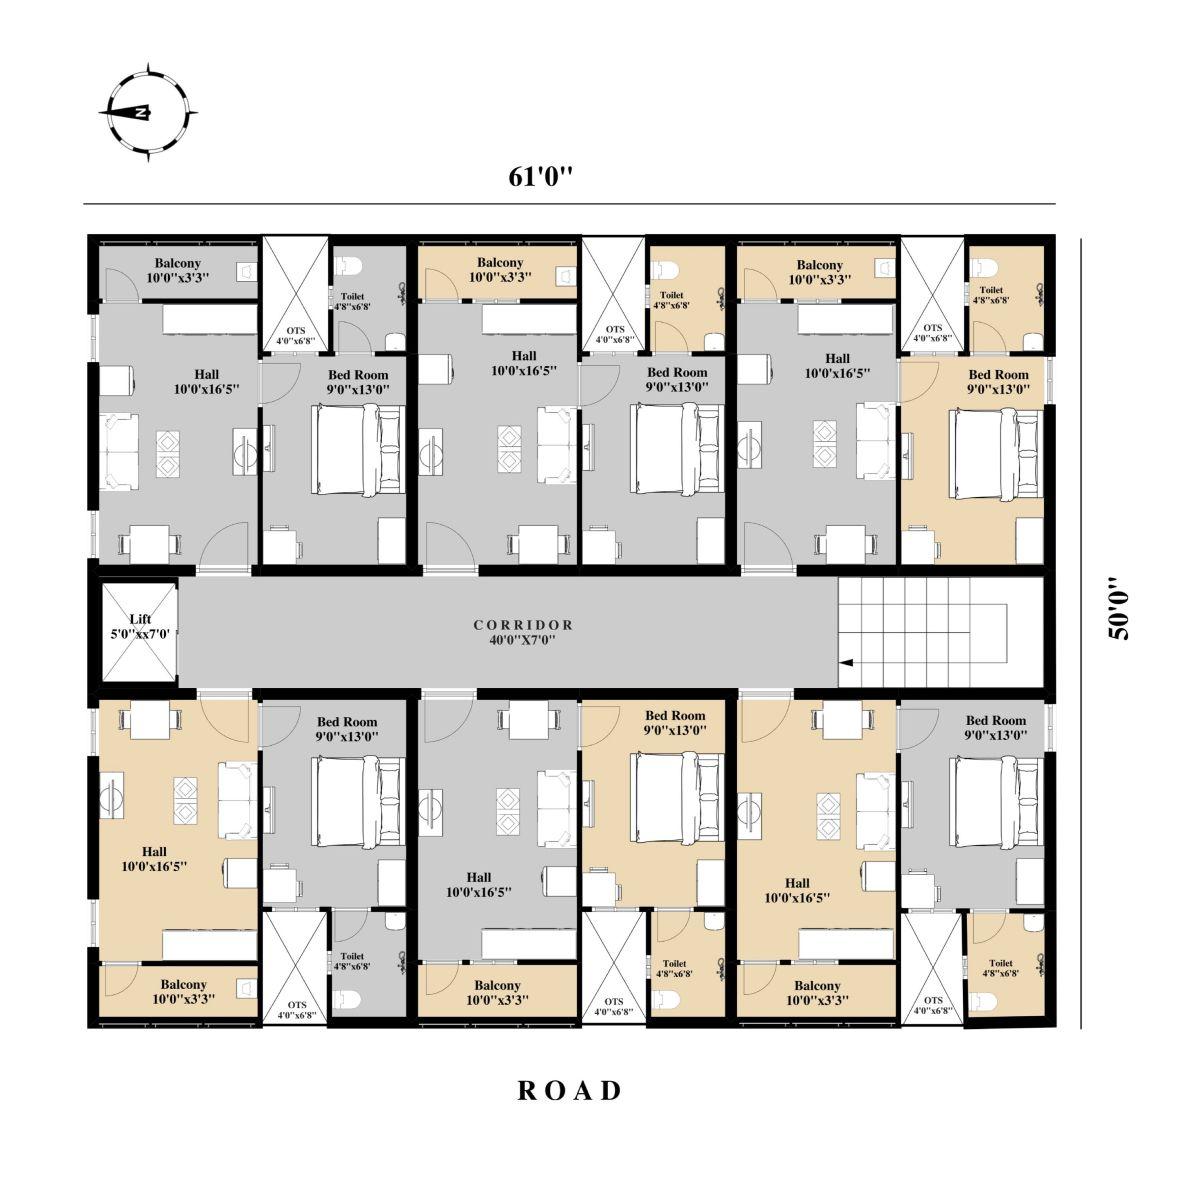 Hotel Layout Made On Floorplanner Com Floor Plans Create Floor Plan Interior Design Software